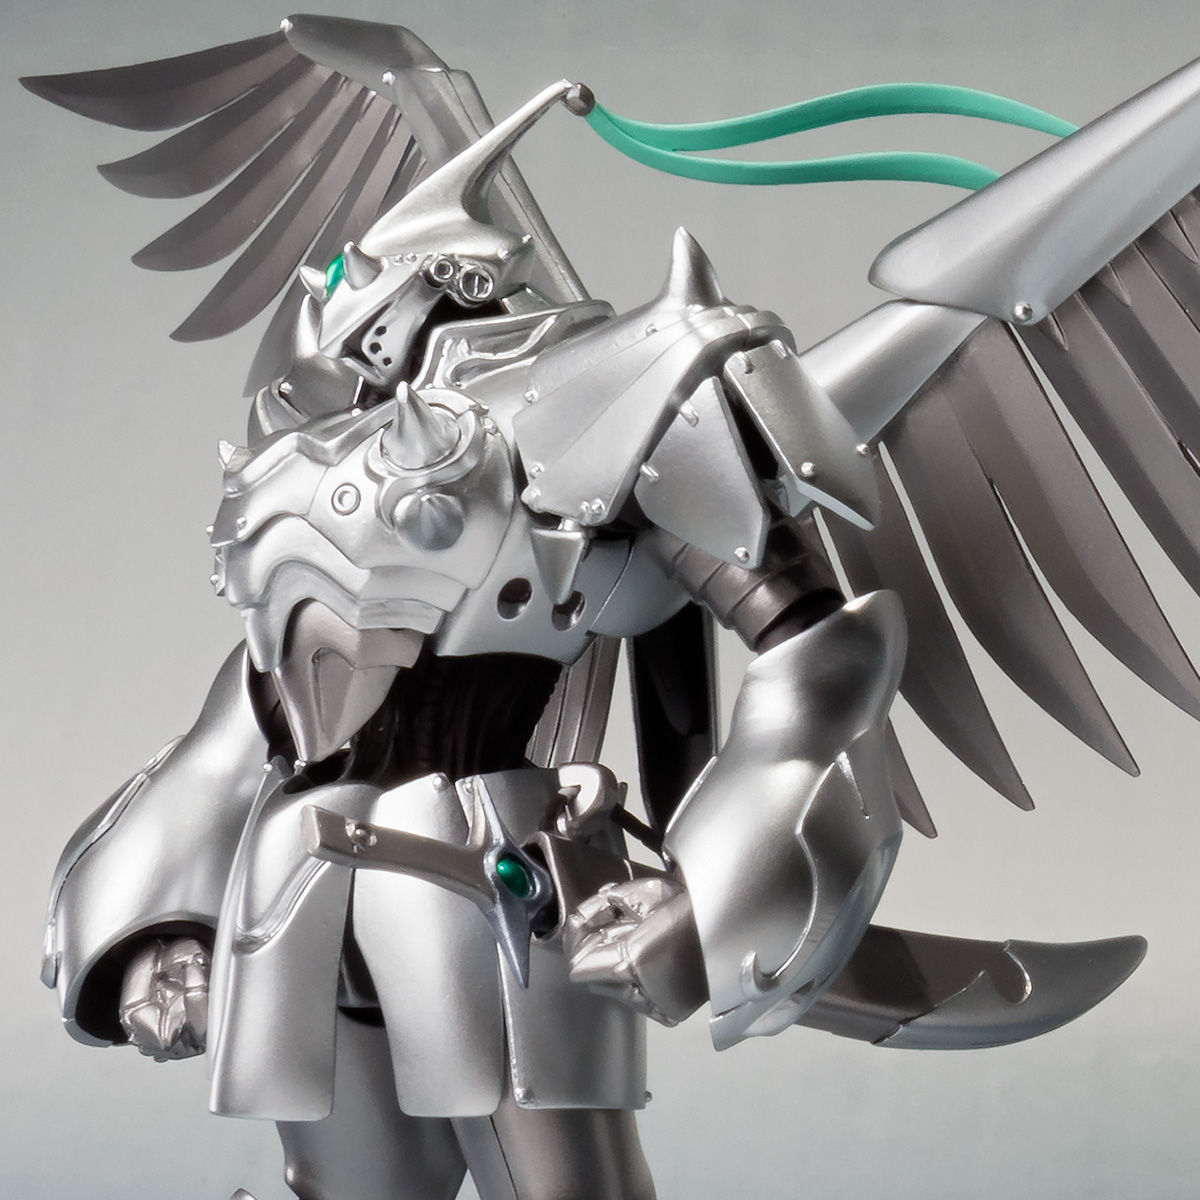 ROBOT魂〈SIDE PB〉『飛甲兵』機甲界ガリアン 鉄の紋章 可動フィギュア-001